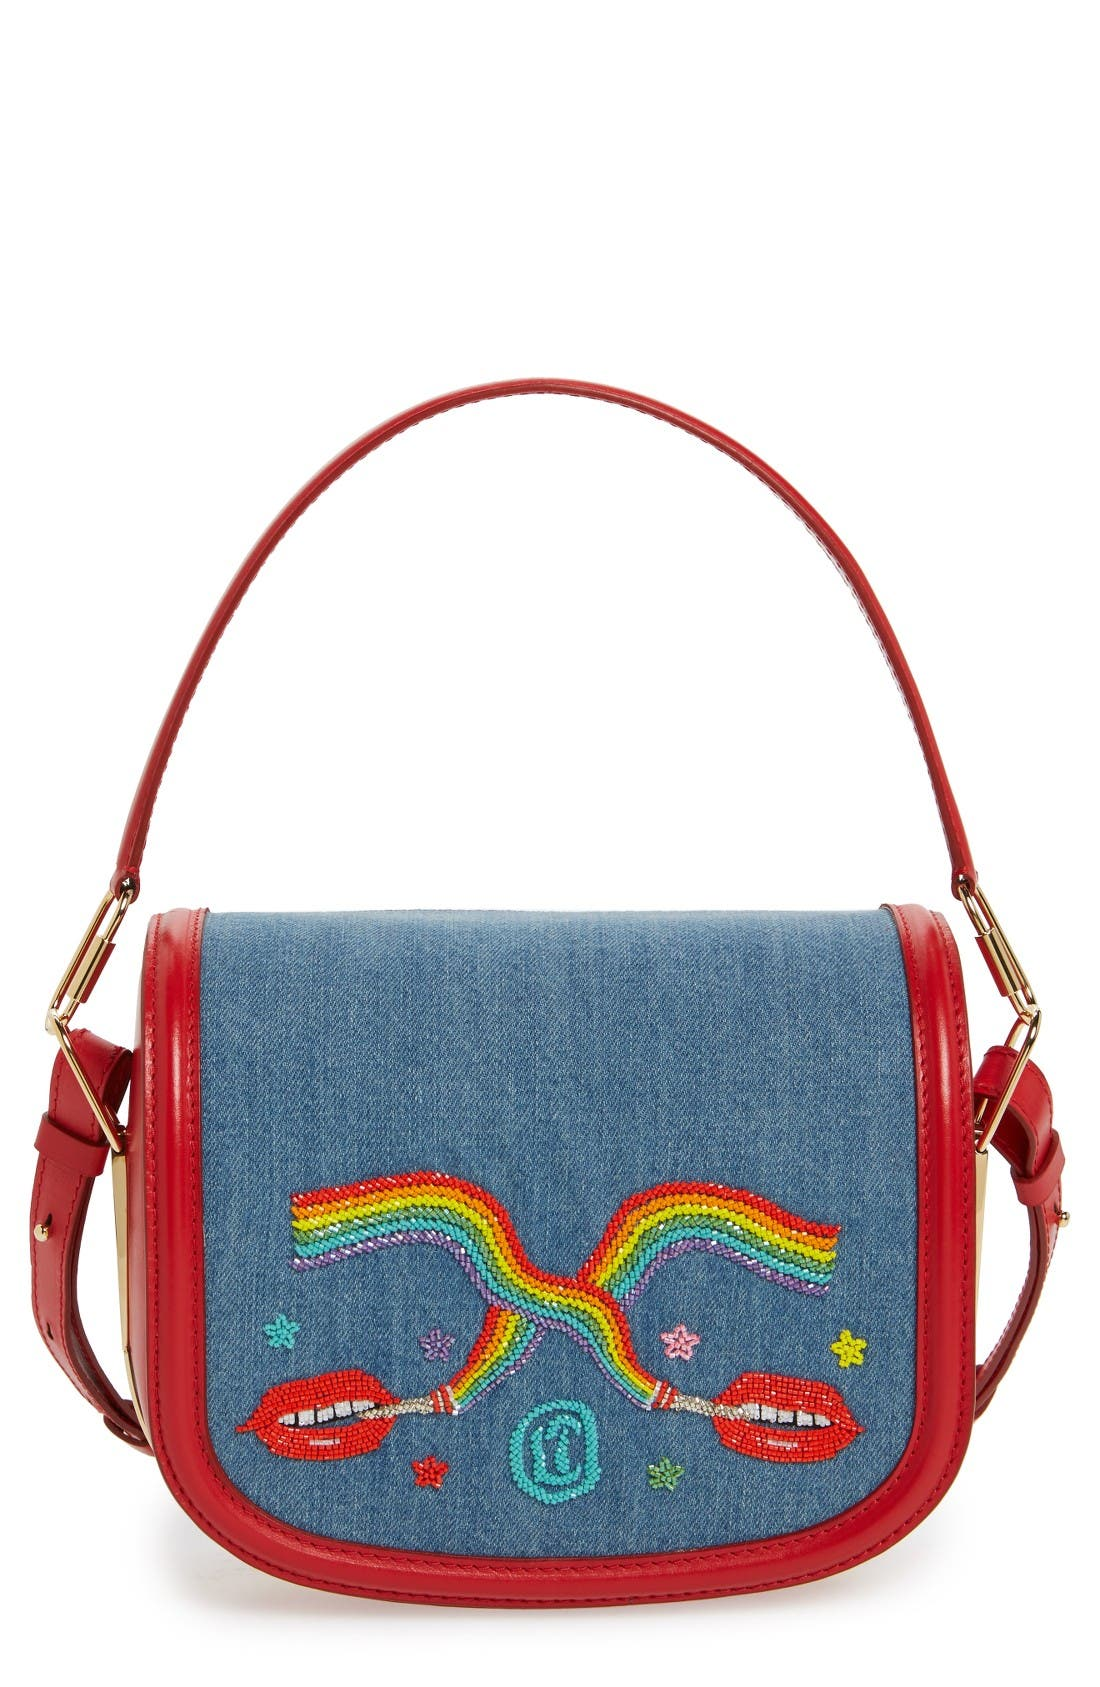 Dutchies Crossbody Bag,                         Main,                         color, Blue